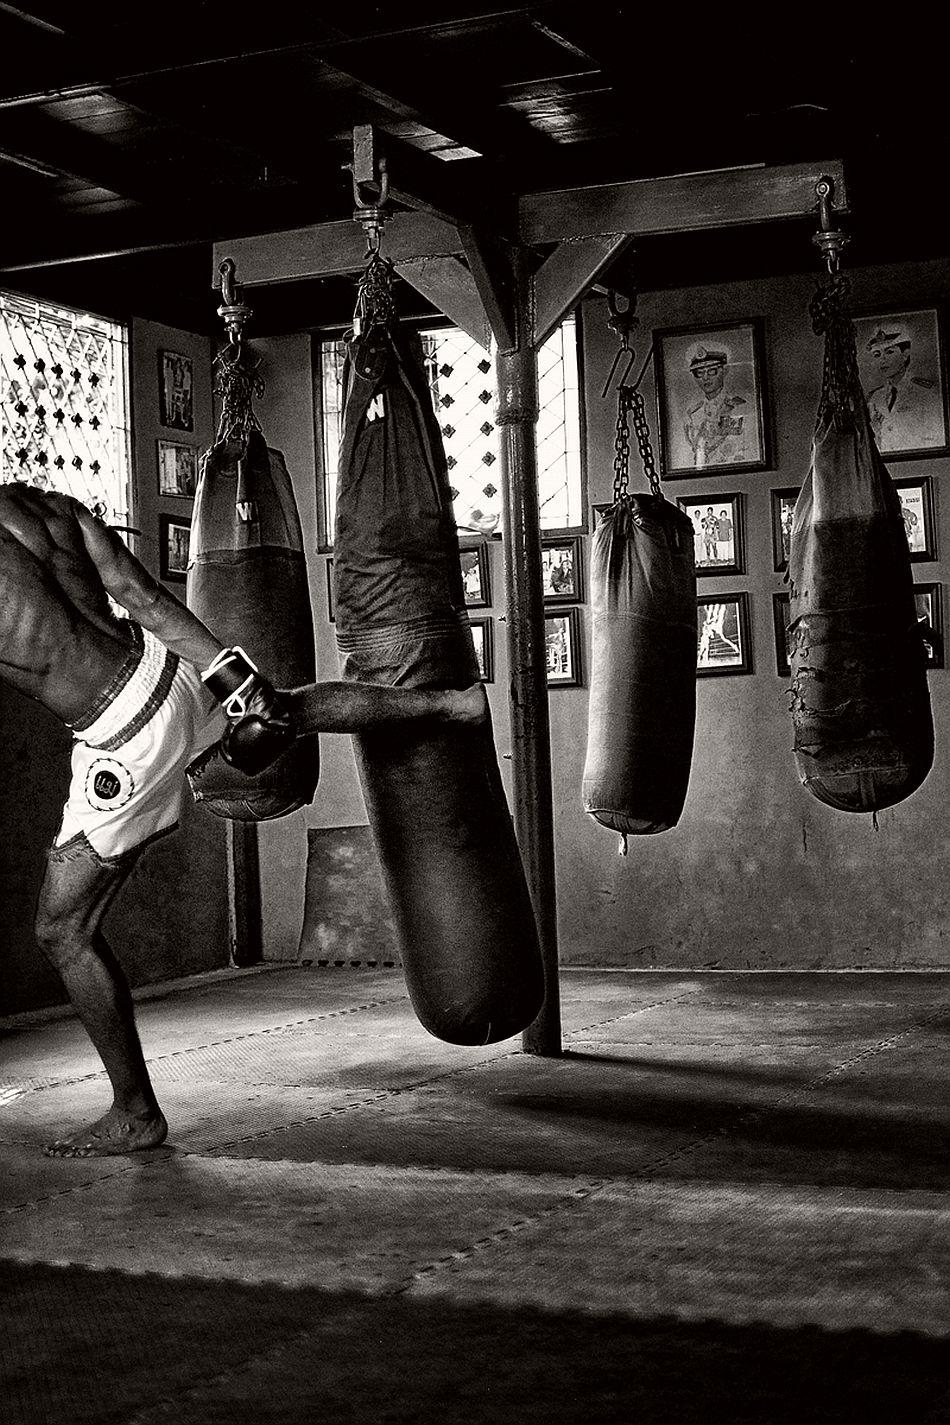 davide-palmisano-the-muay-thai-boxing-08